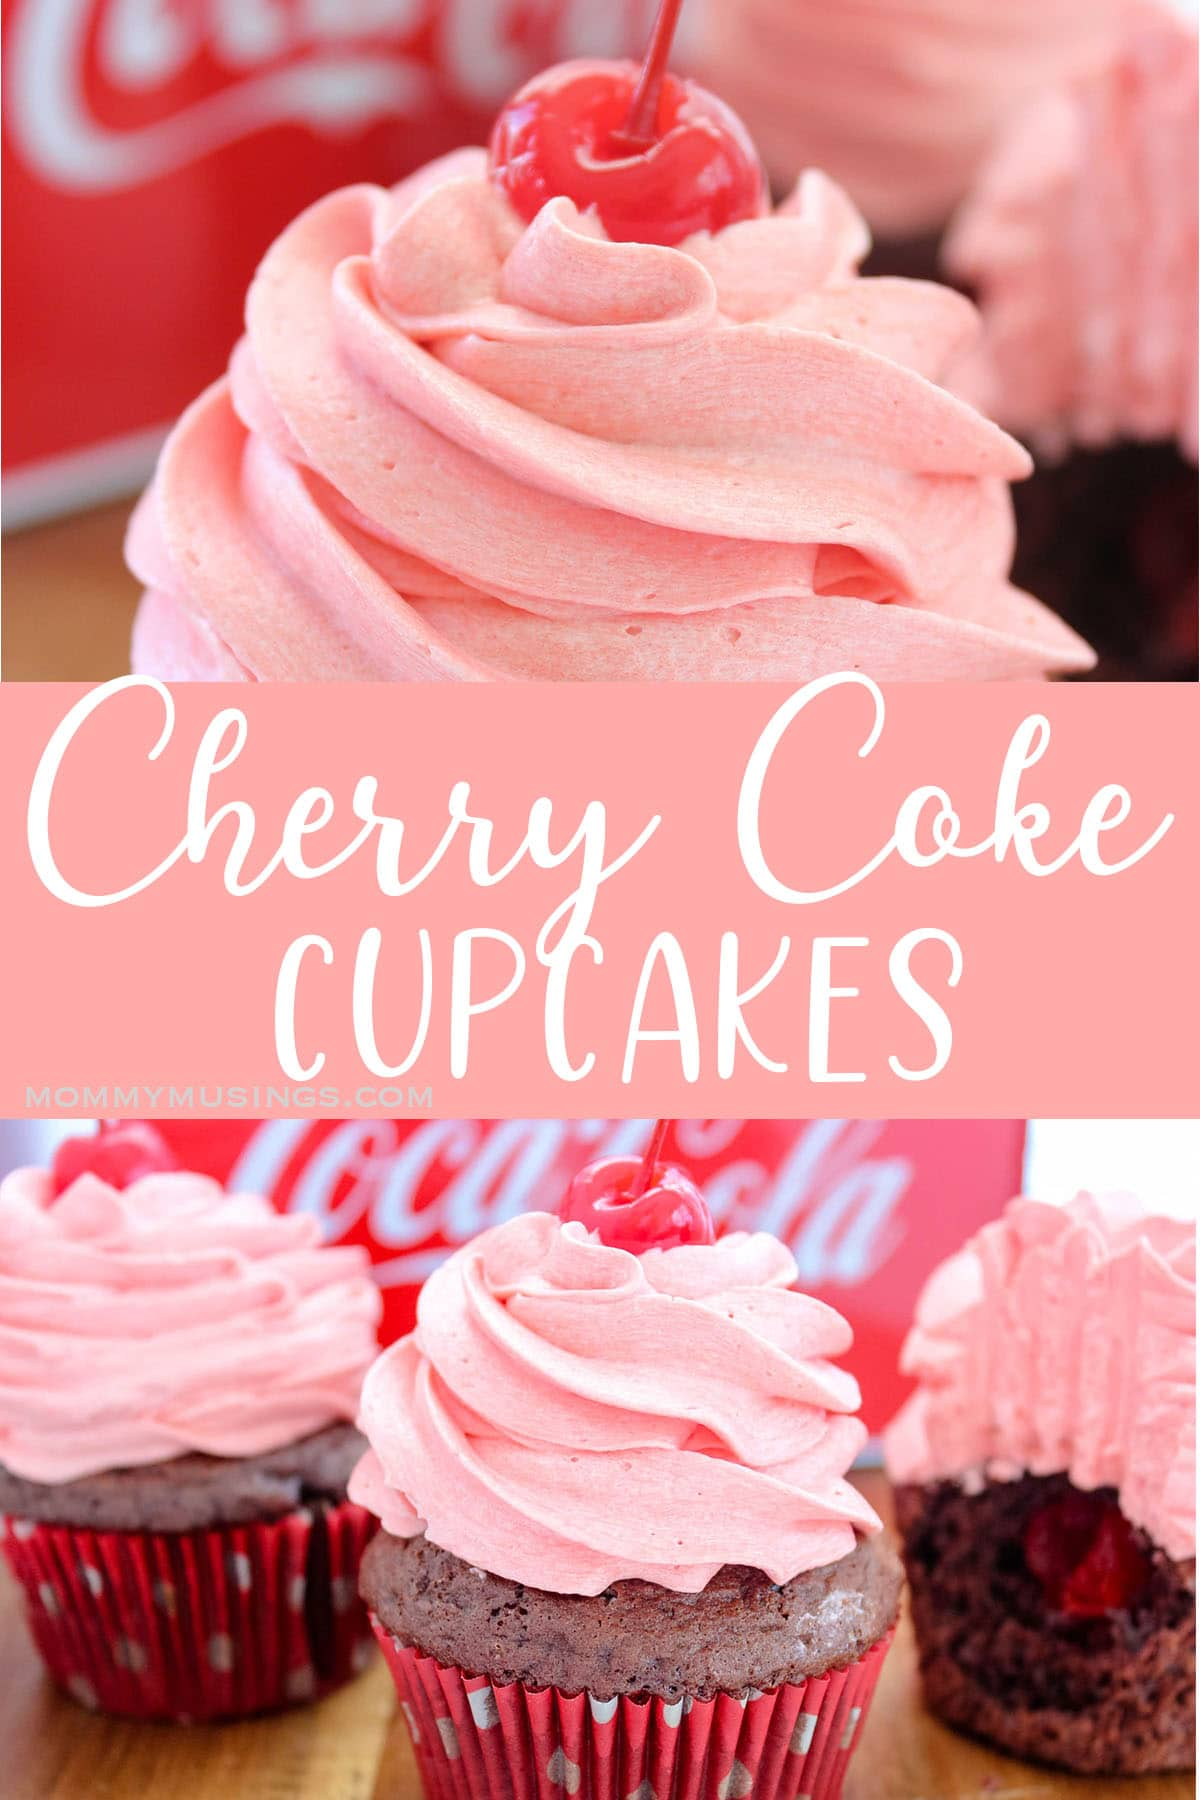 photo collage of cherry coke cupcake